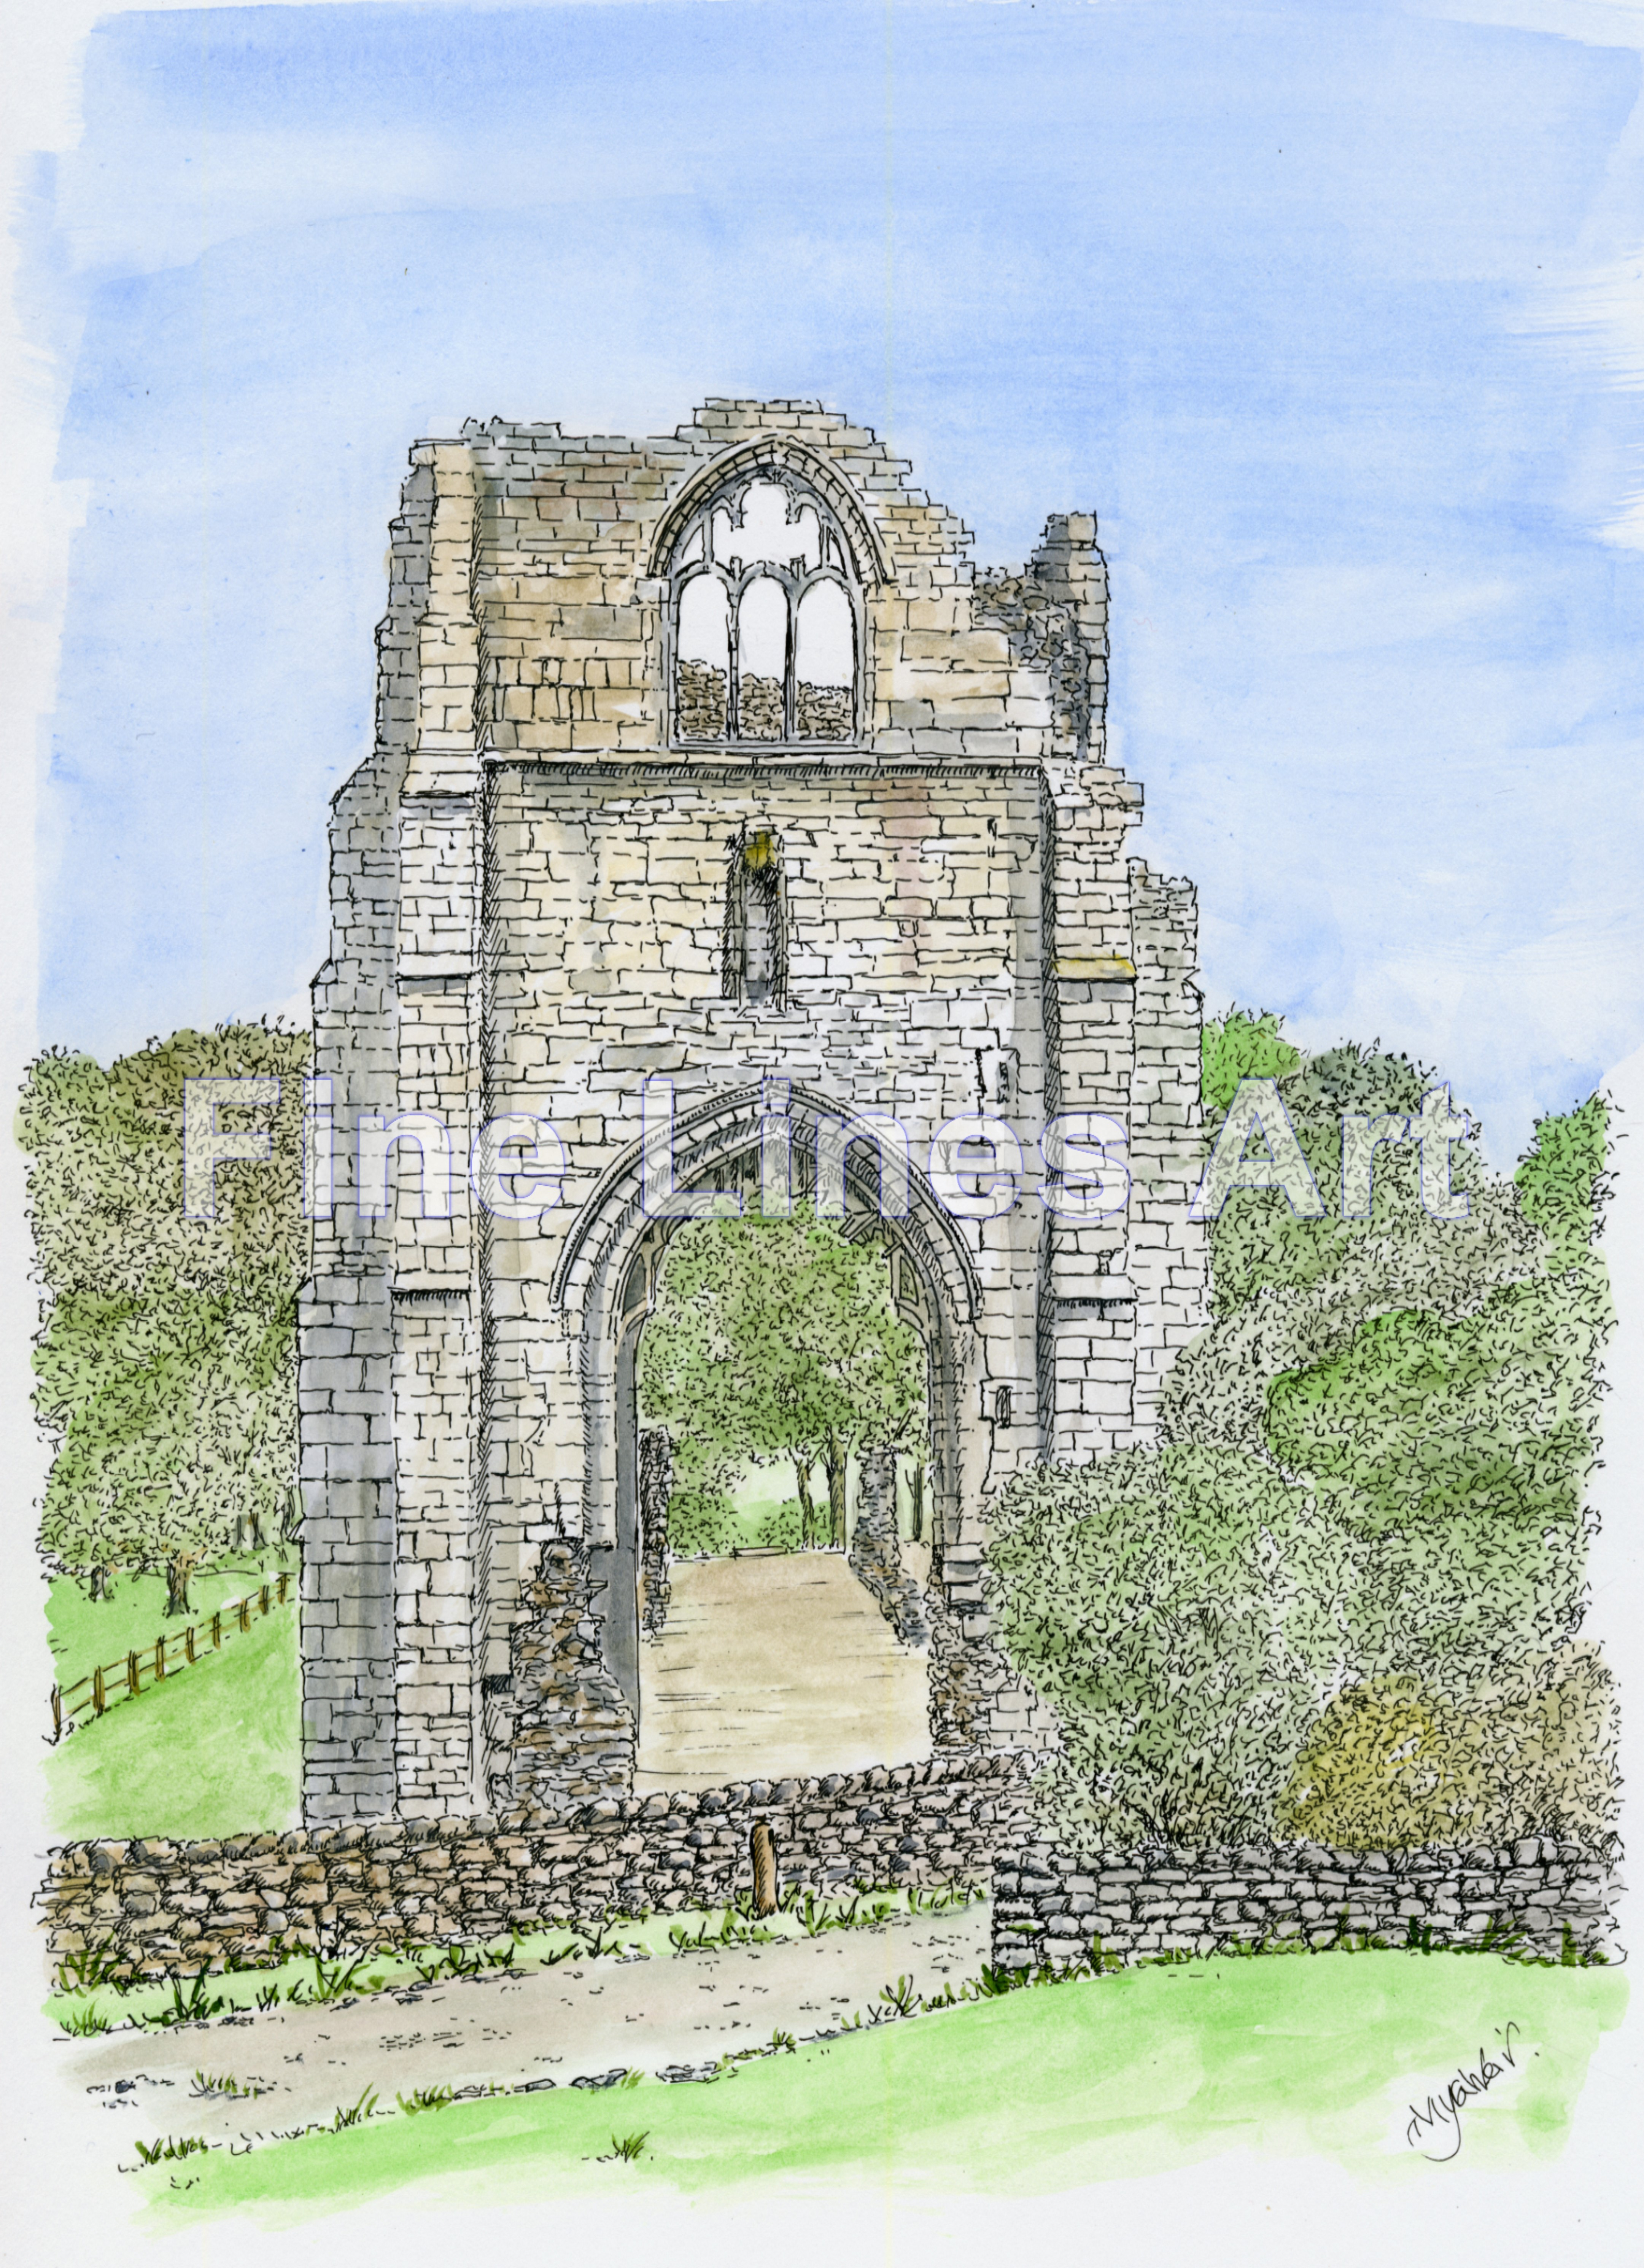 Shap Abbey, Cumbria, UK